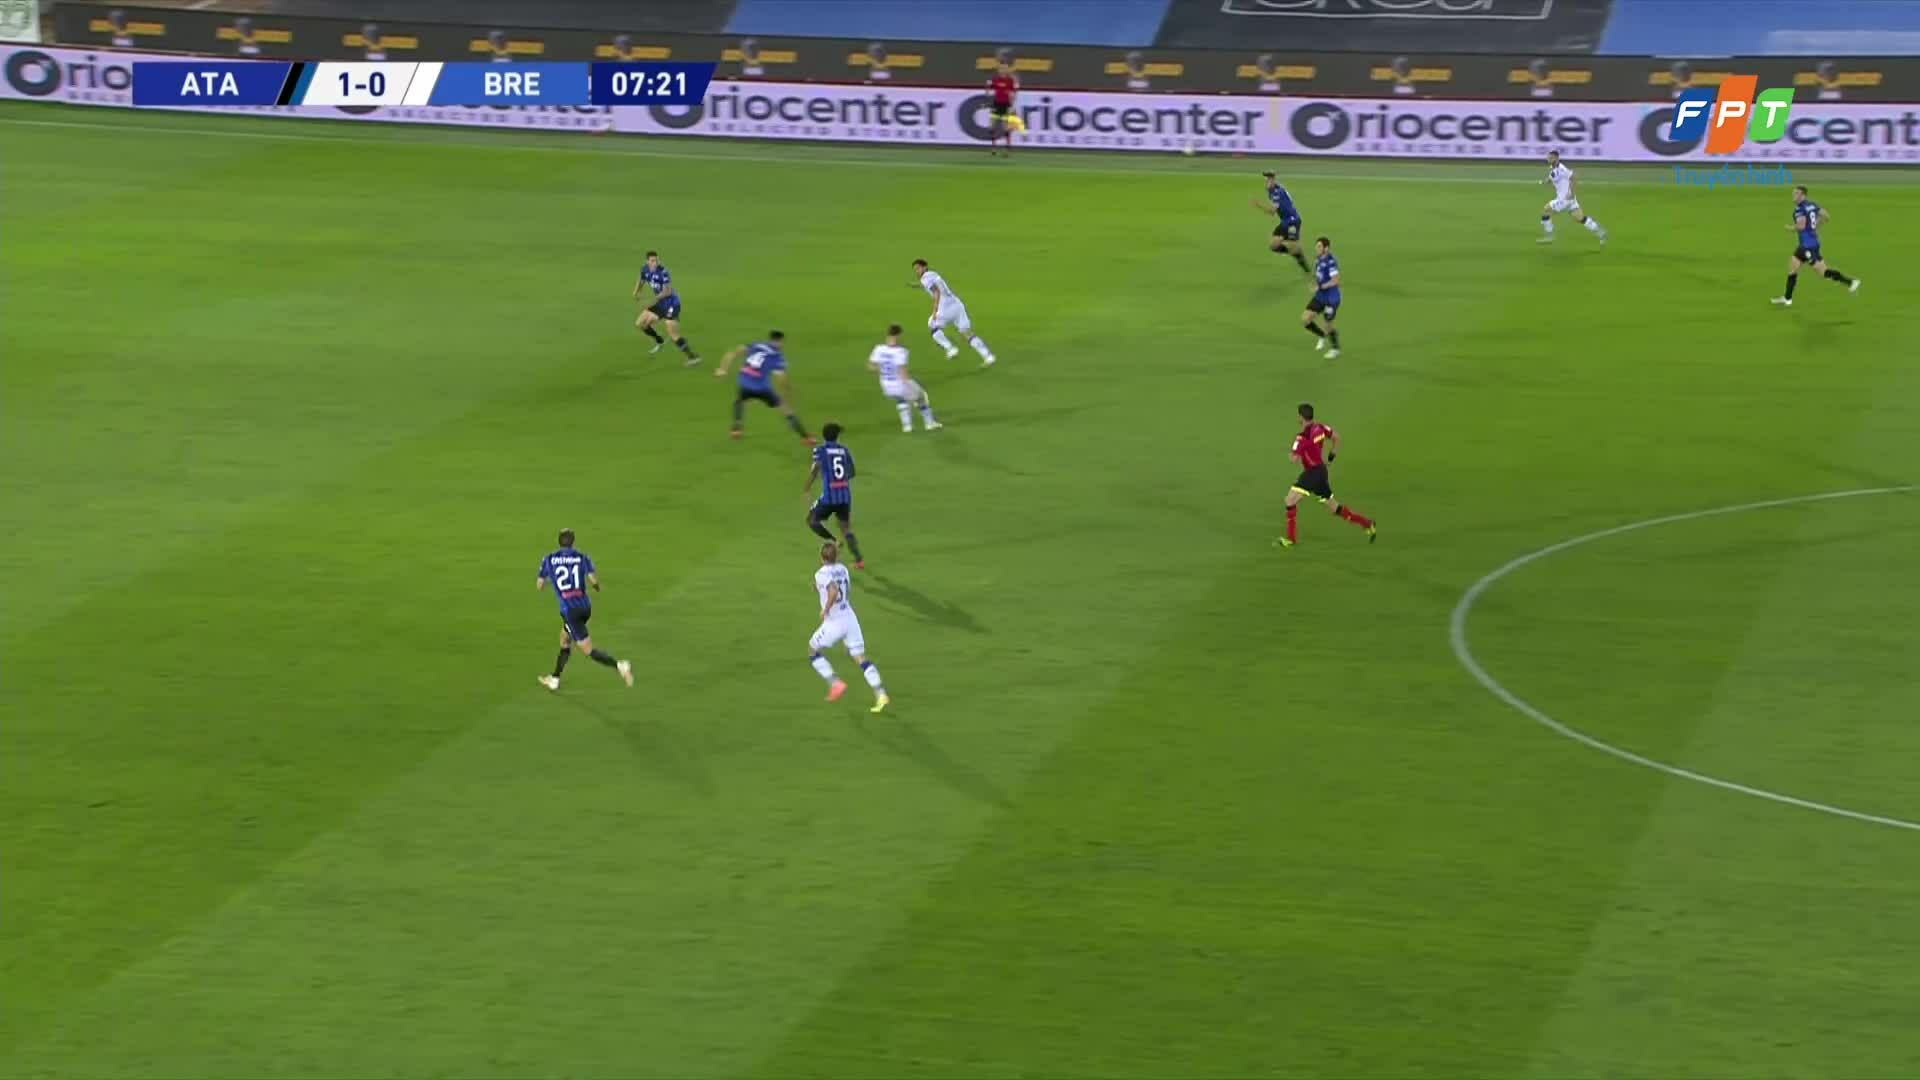 Atalanta 6-2 Brescia